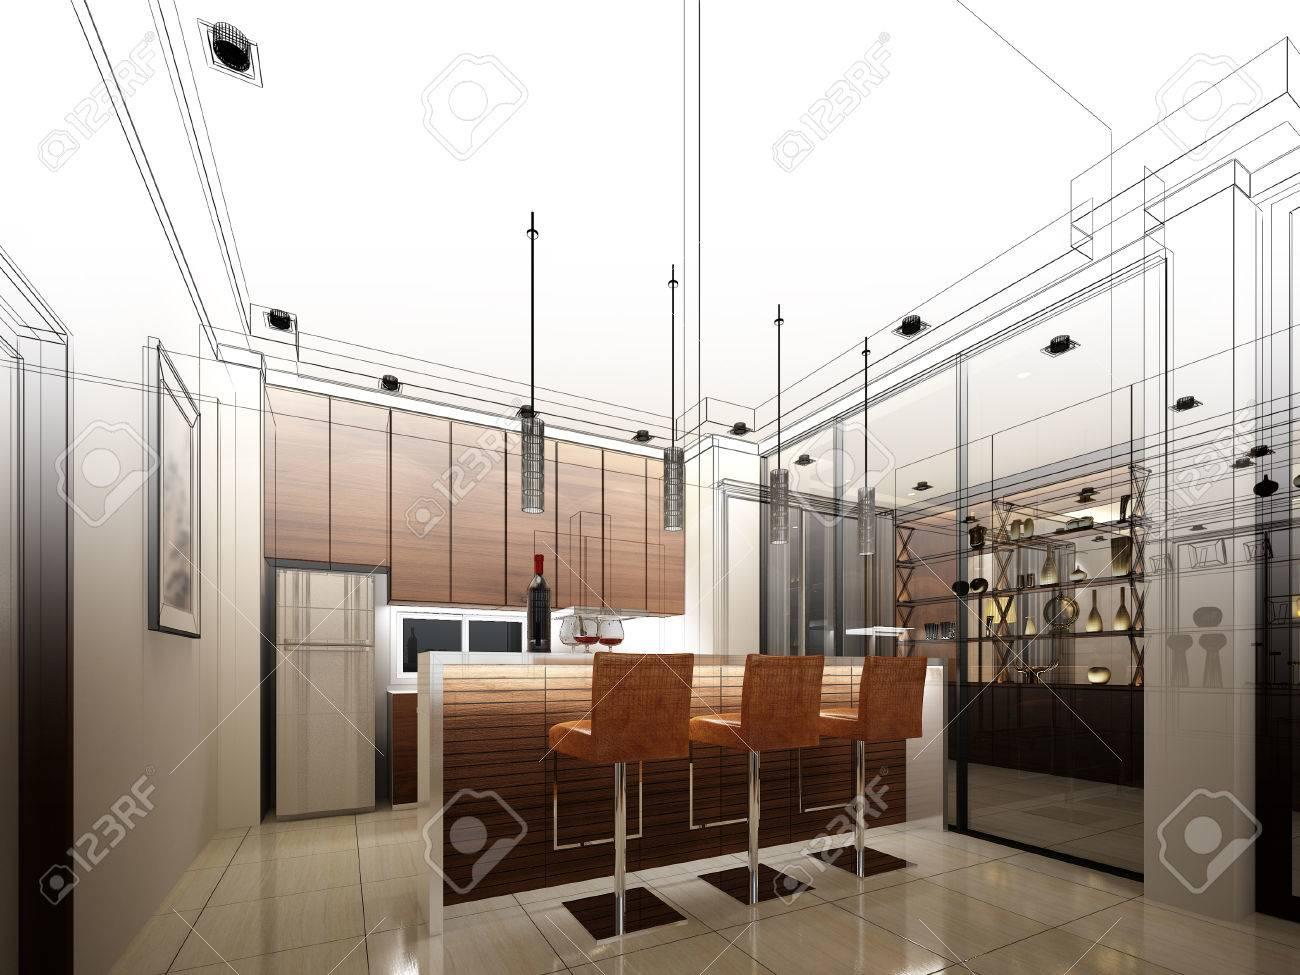 abstract sketch design of interior kitchen - 50113408